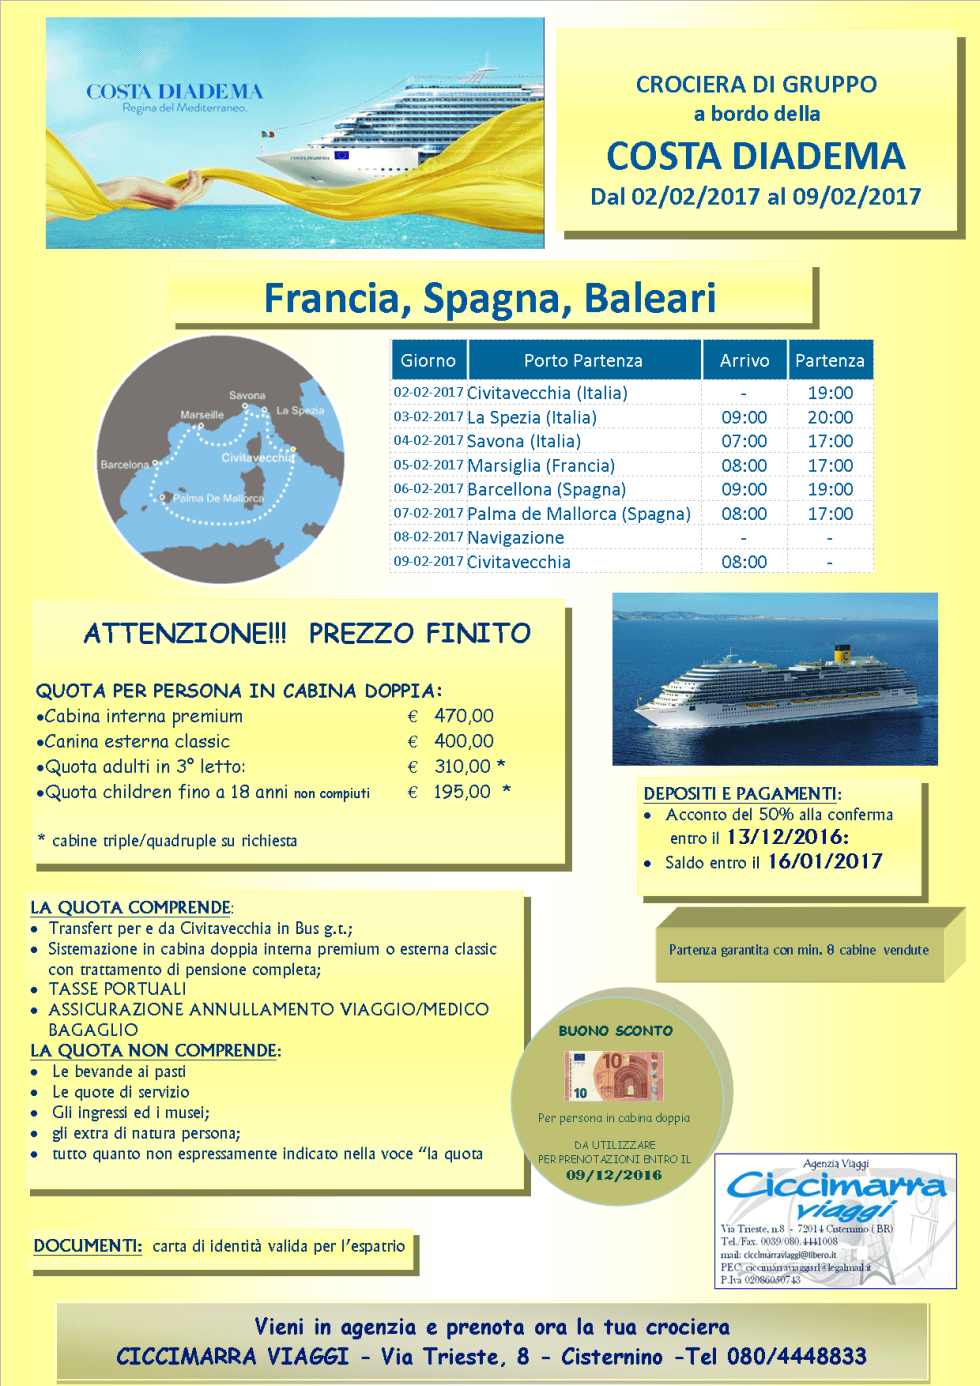 Costa Diadema cruise